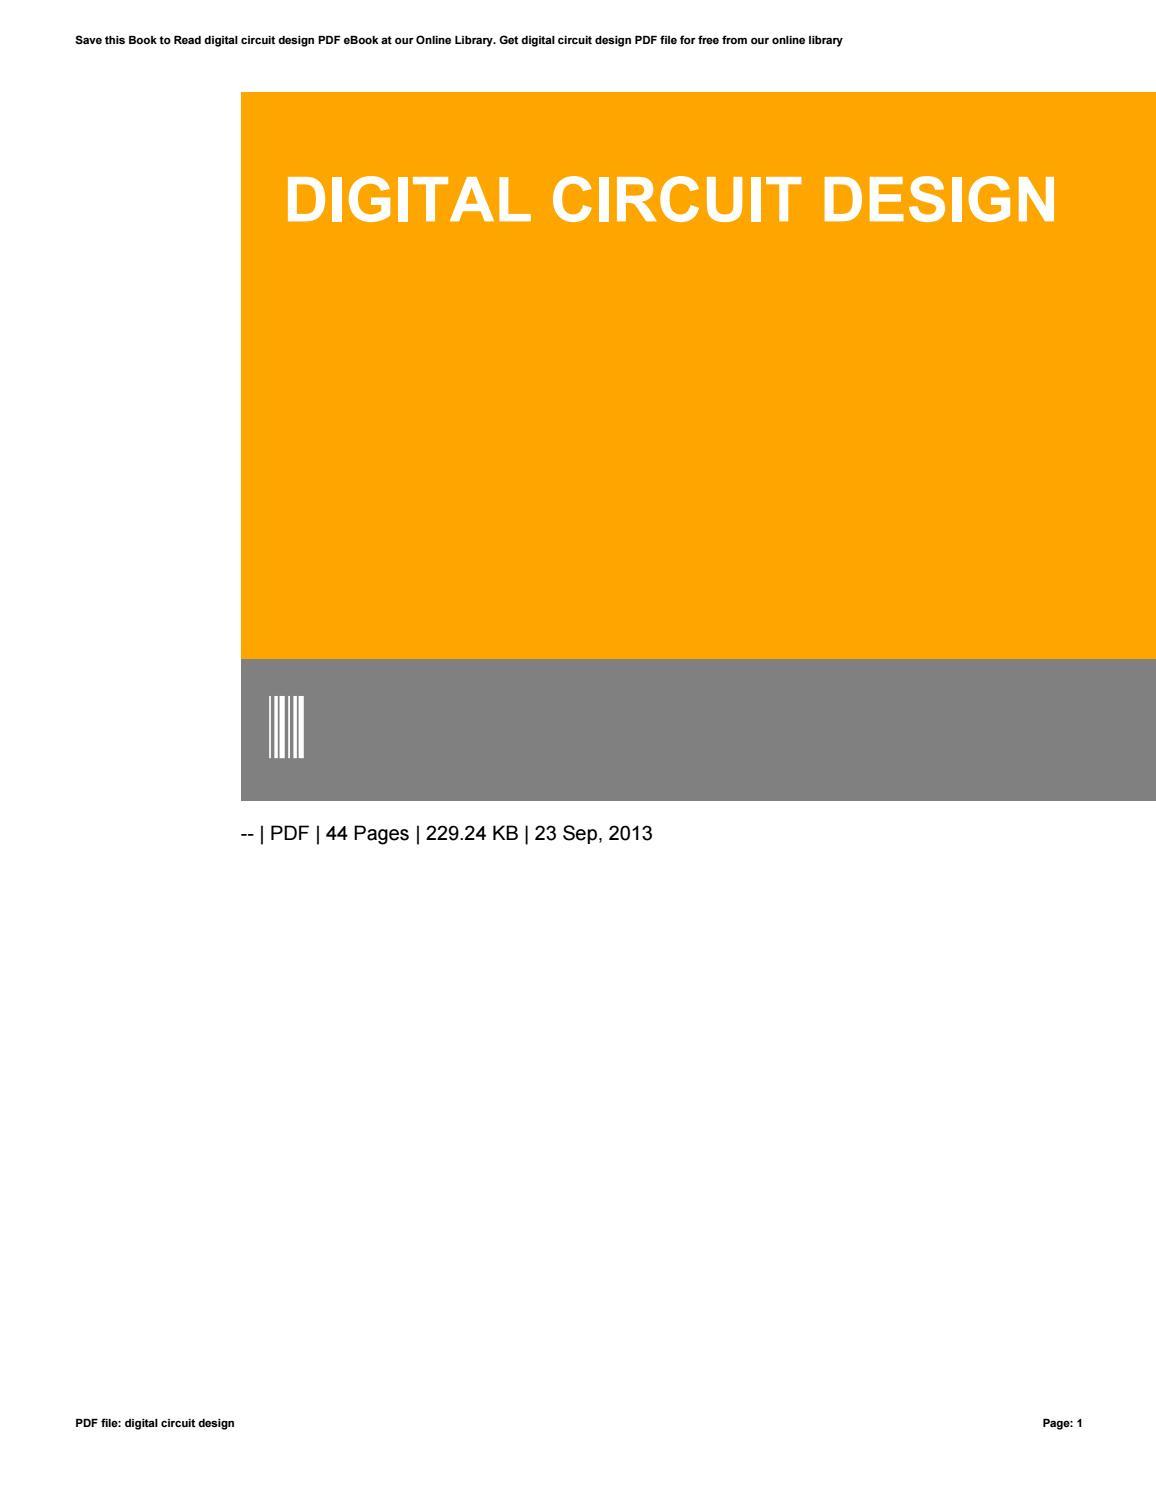 Free Online Circuit Design